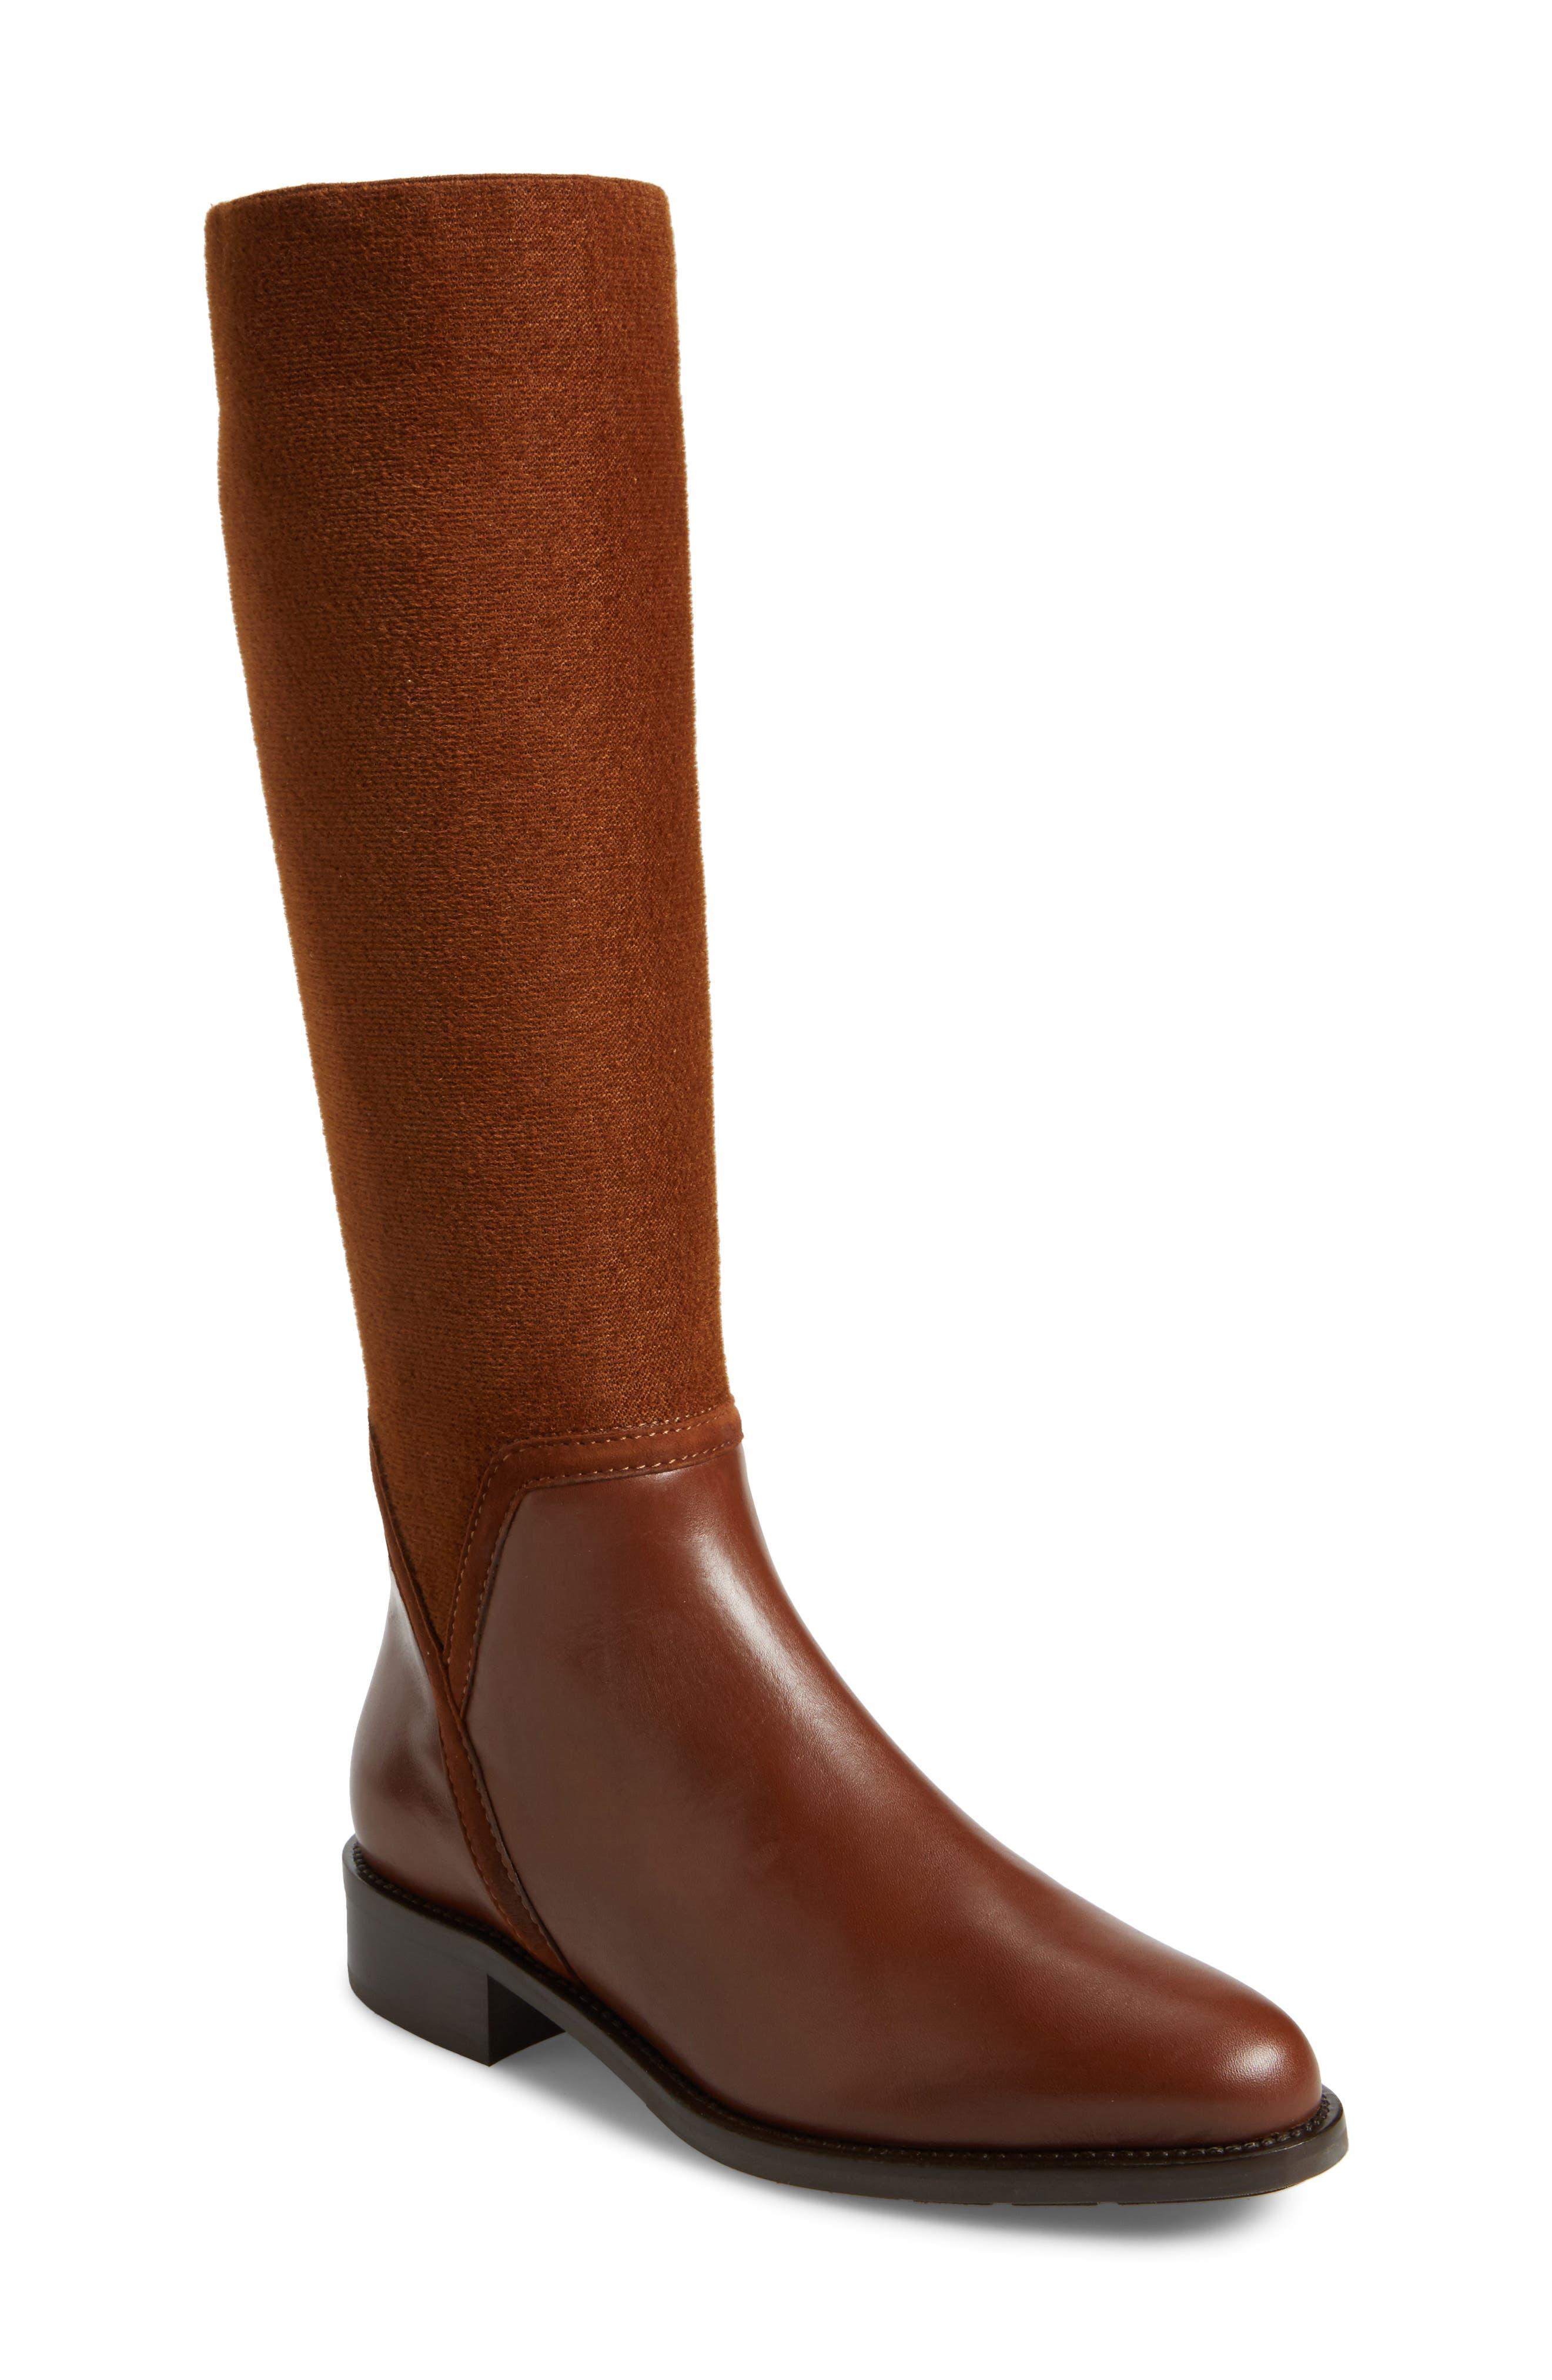 Nicolette Weatherproof Knee High Boot,                         Main,                         color, Castagno Calf/ Elastic